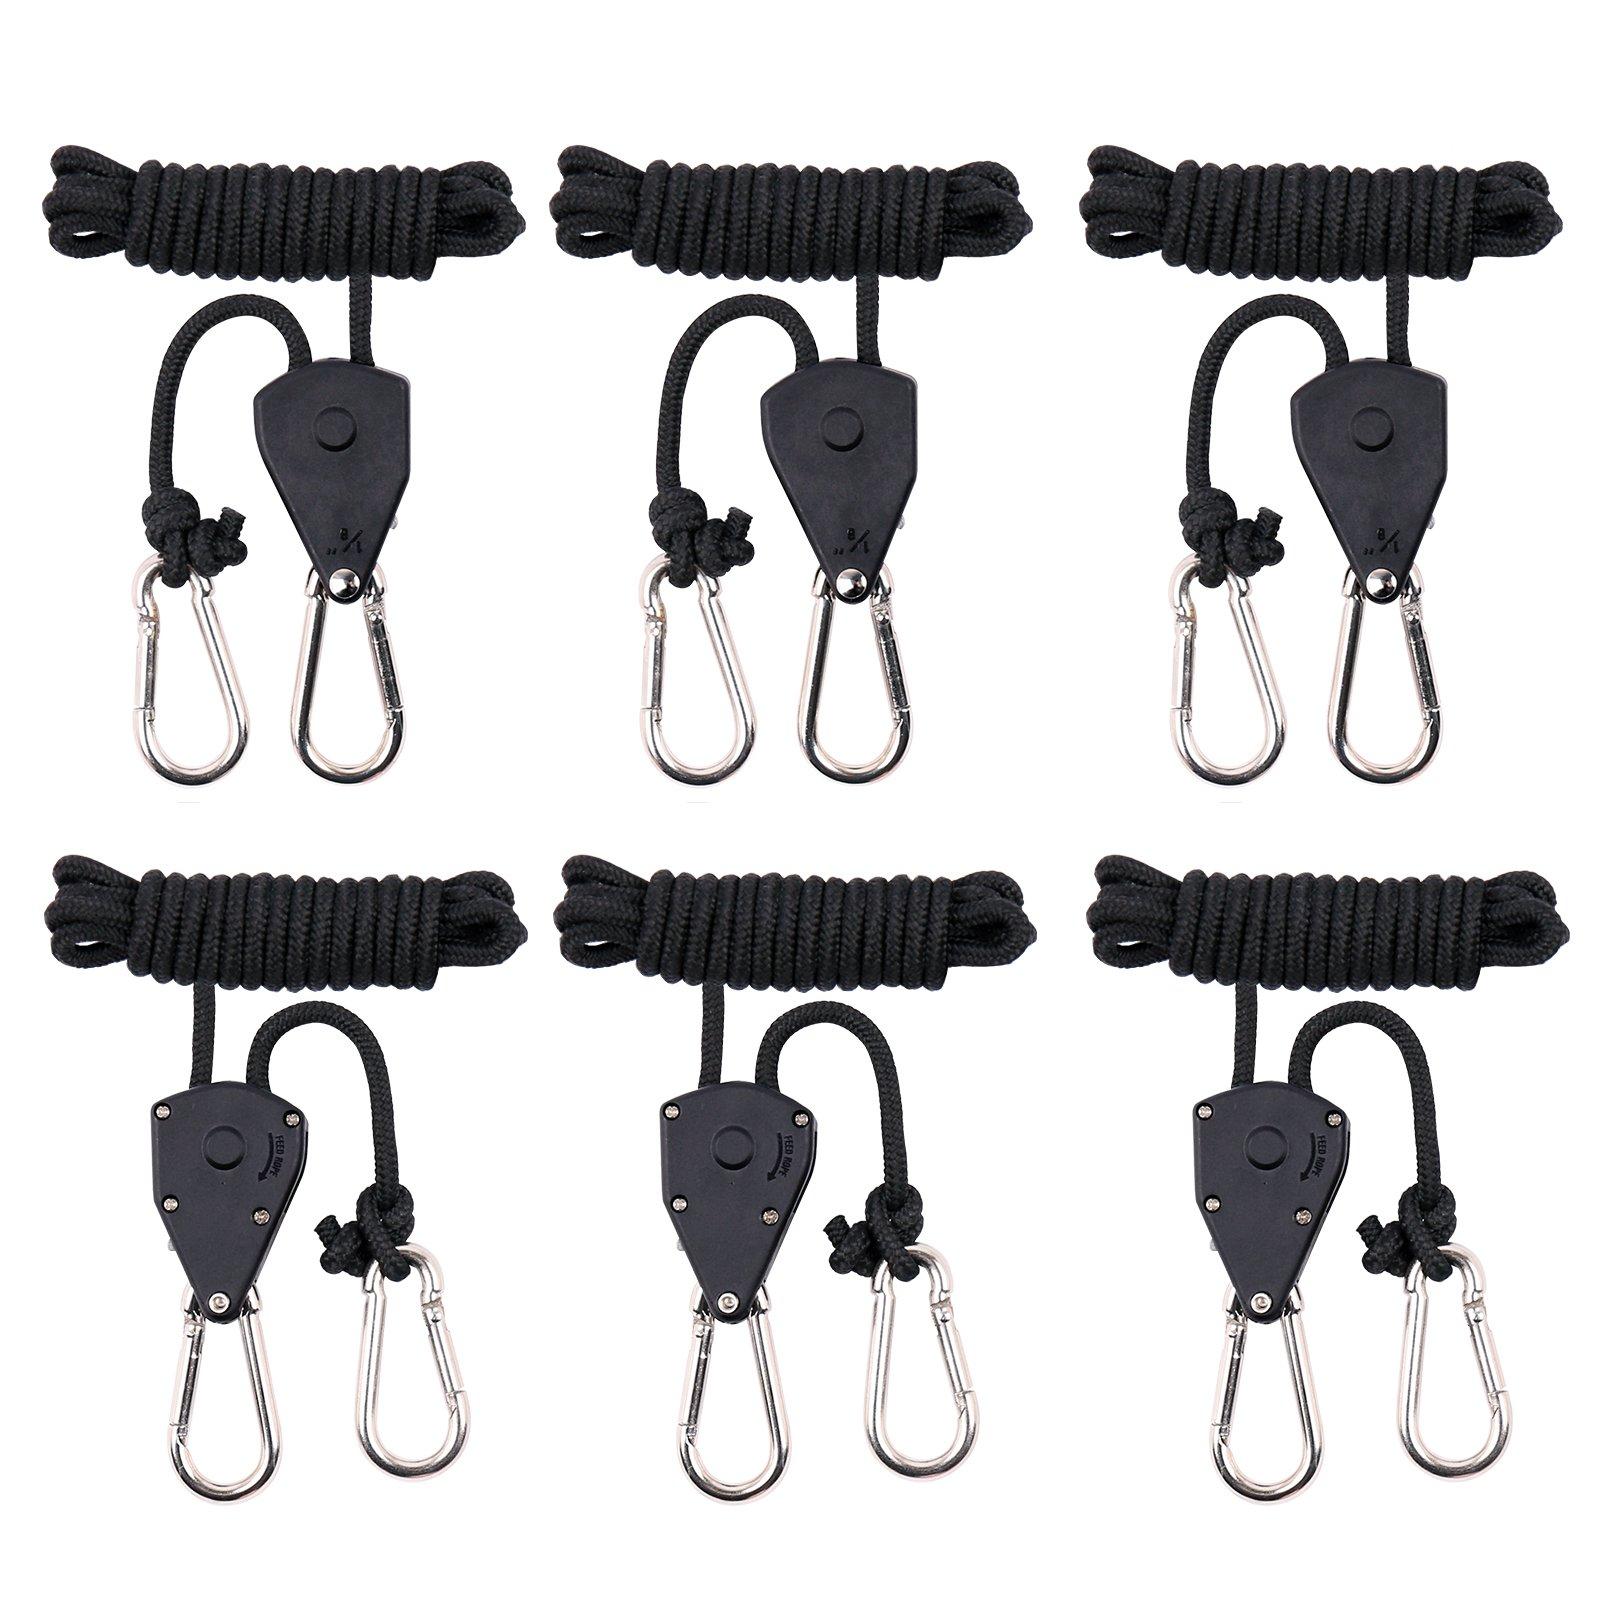 "MAXSISUN 3-Pair 1/8"" Adjustable Heavy Duty Rope Clip Hanger, Grow Light Ratchet Hanger, 150lbs Weight Capacity"